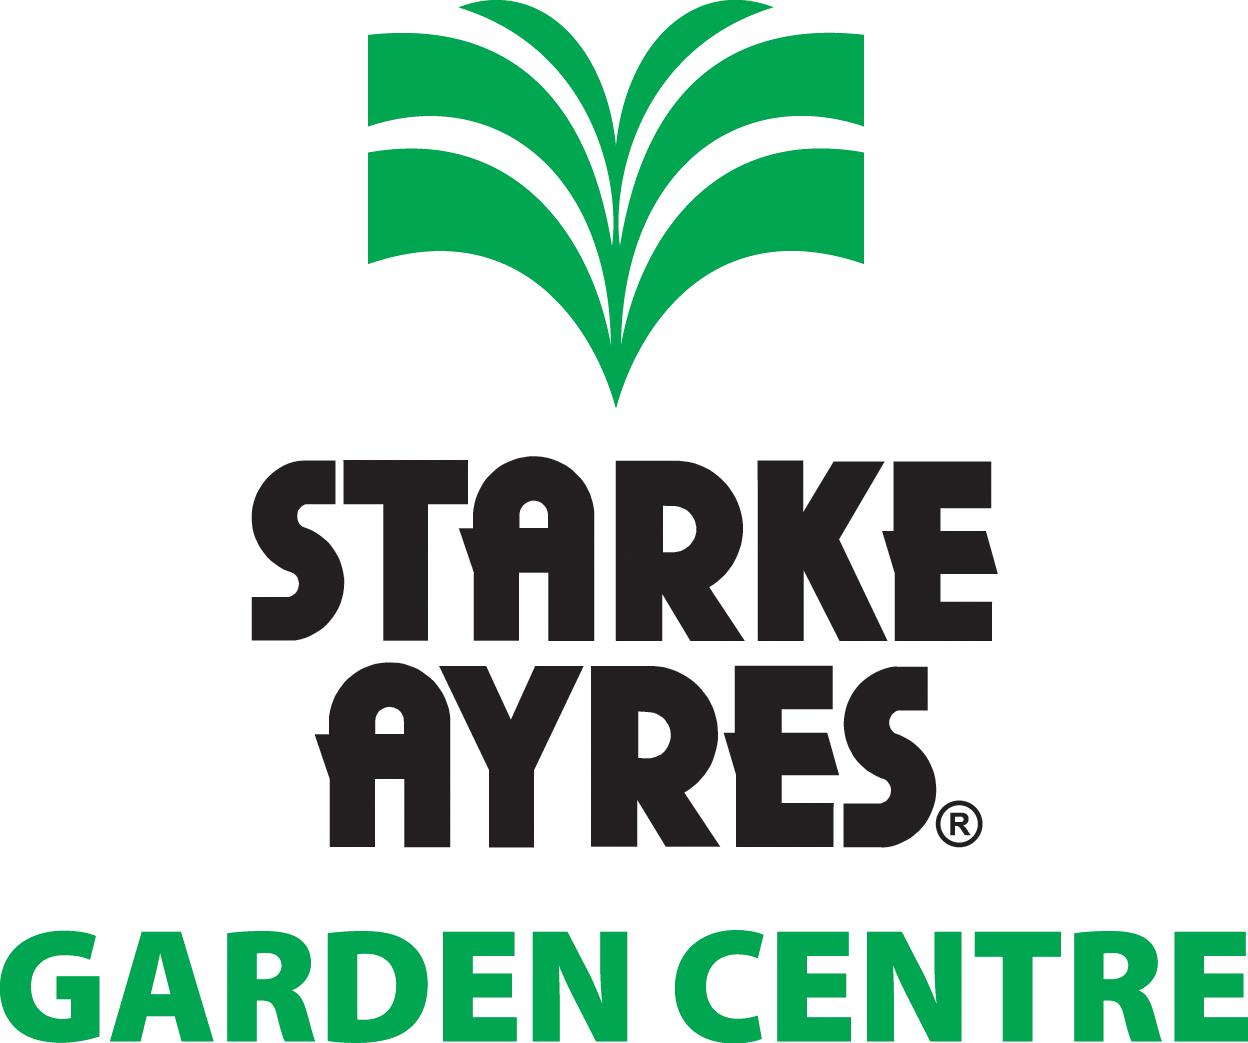 Starke Ayres Garden Centre